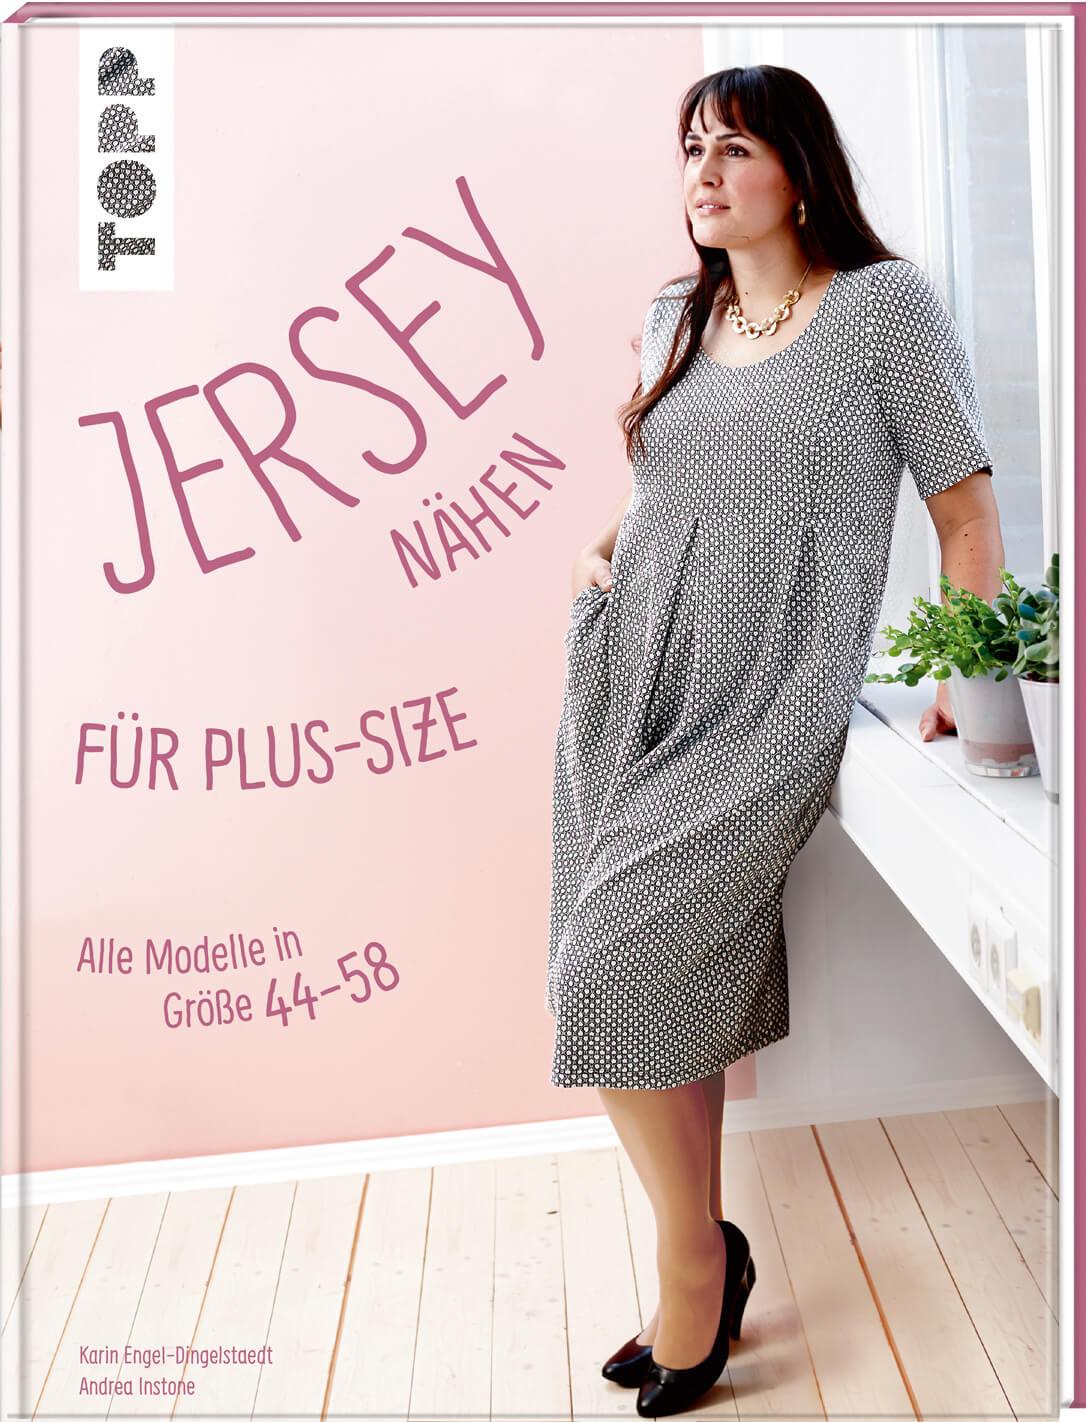 quiltzauberei.de | jersey nähen für plus-size - alle modelle